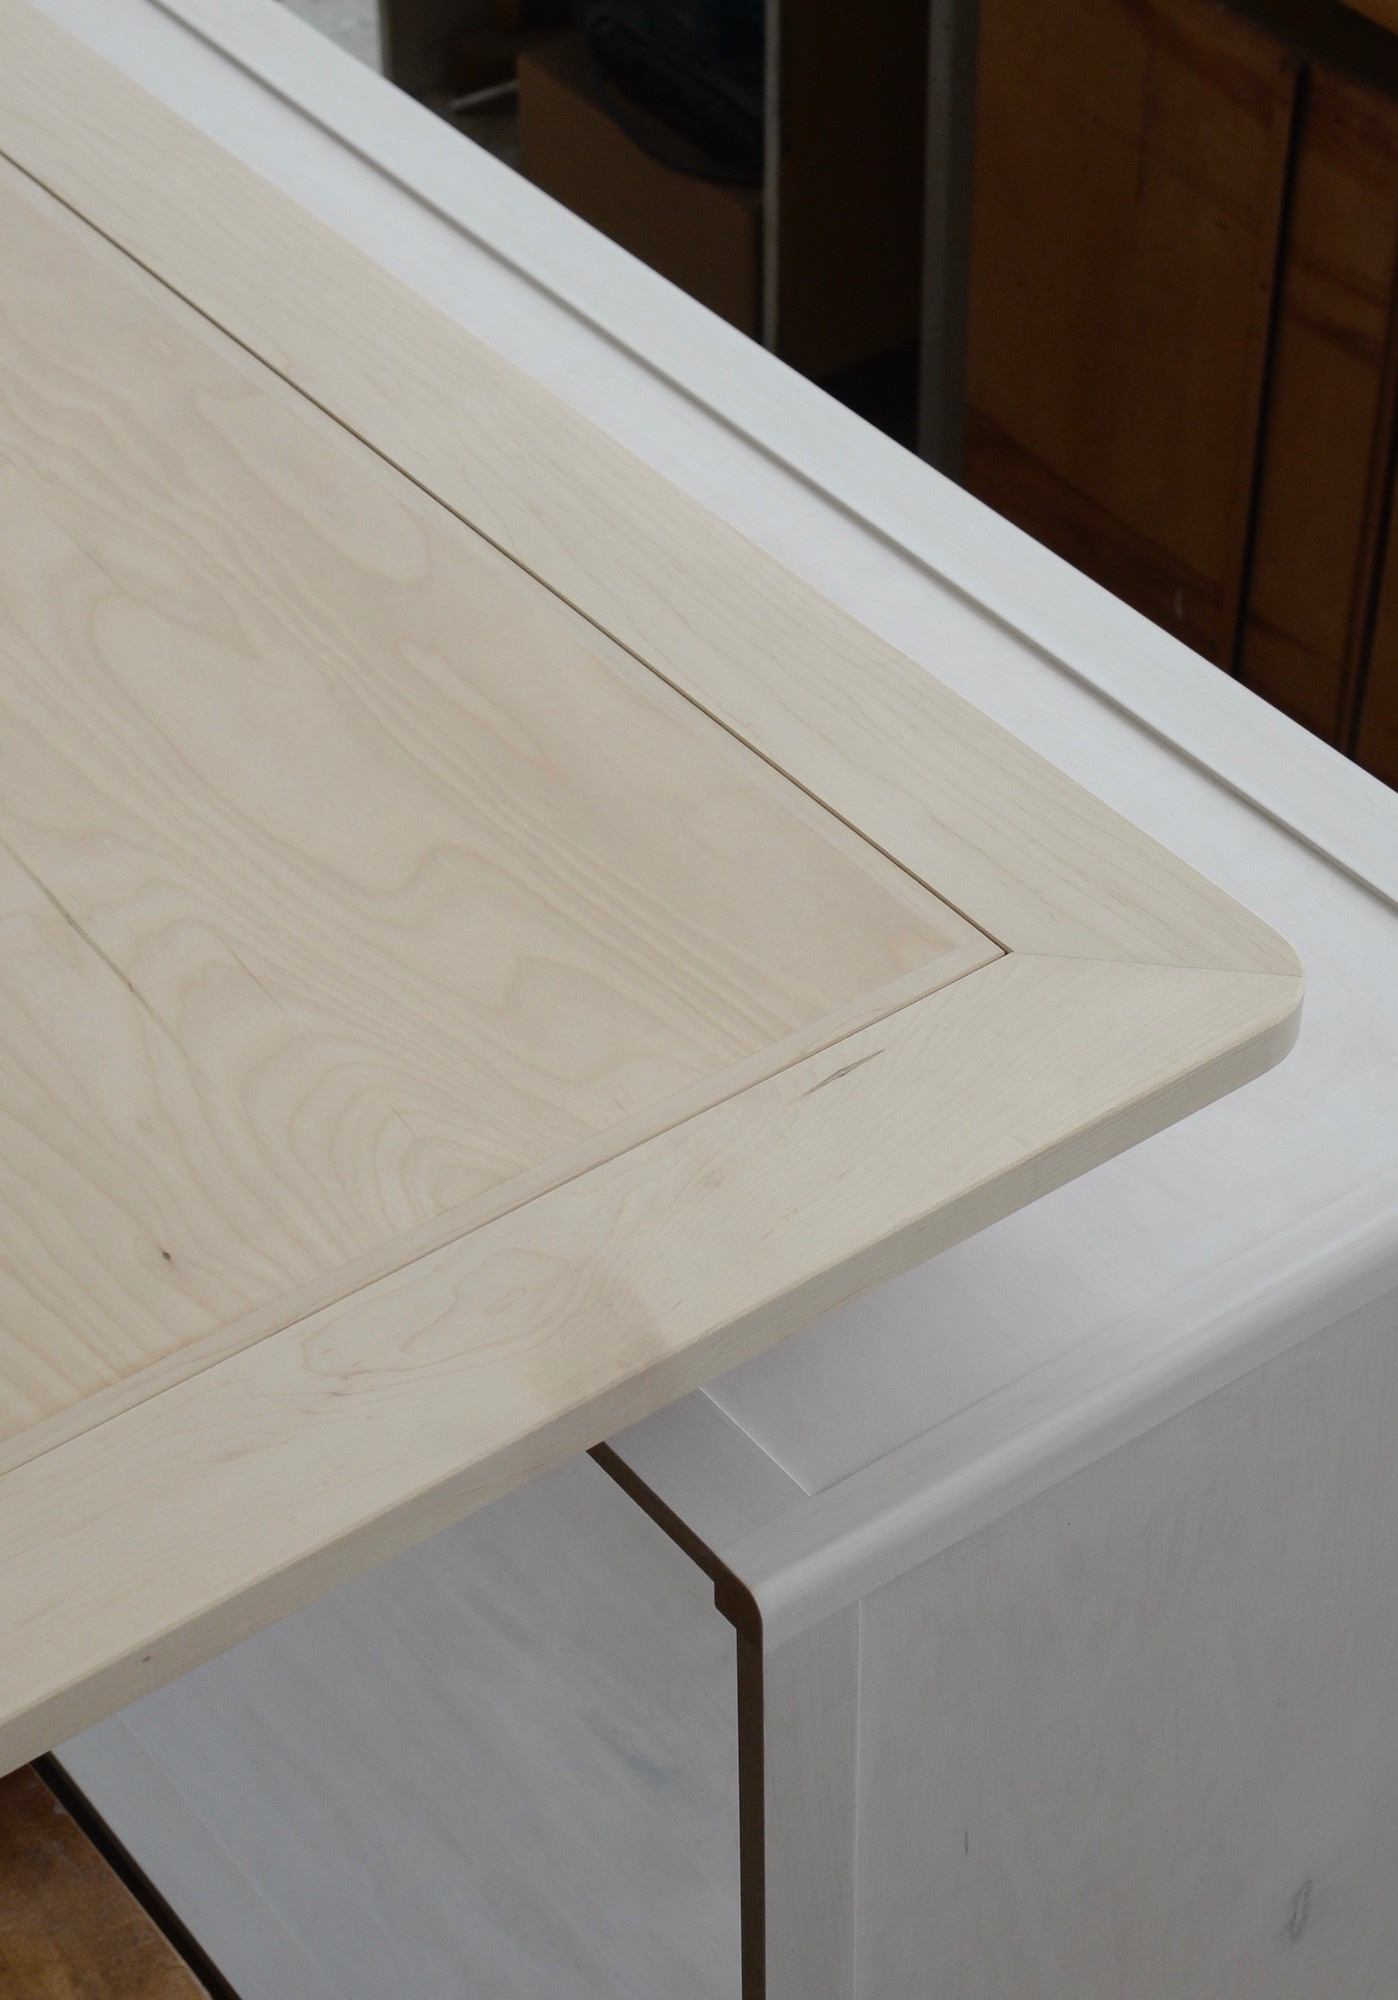 morris-cabinet-bench-3496.jpg